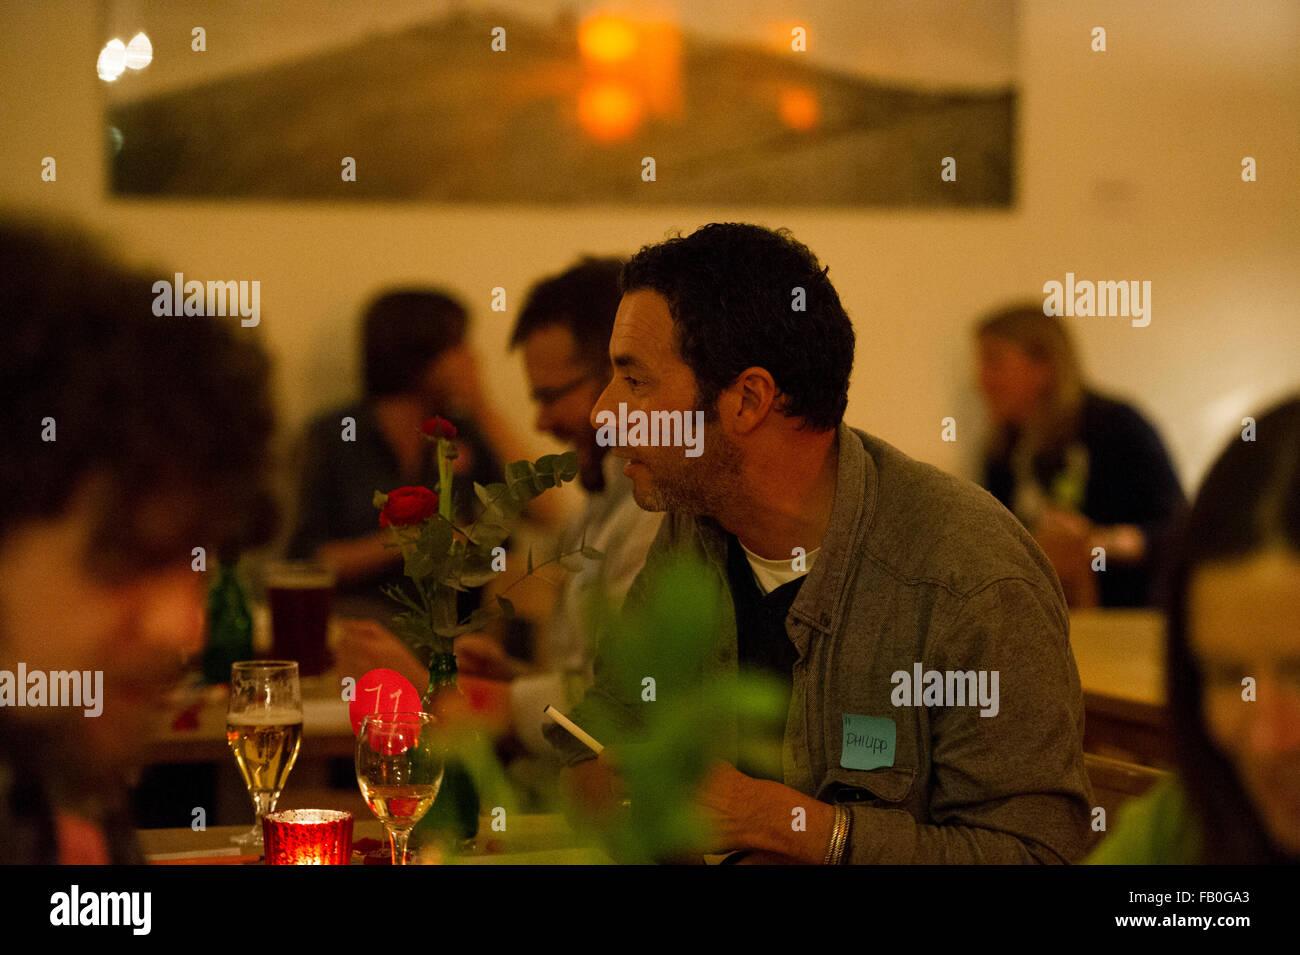 speed dating for christian singles